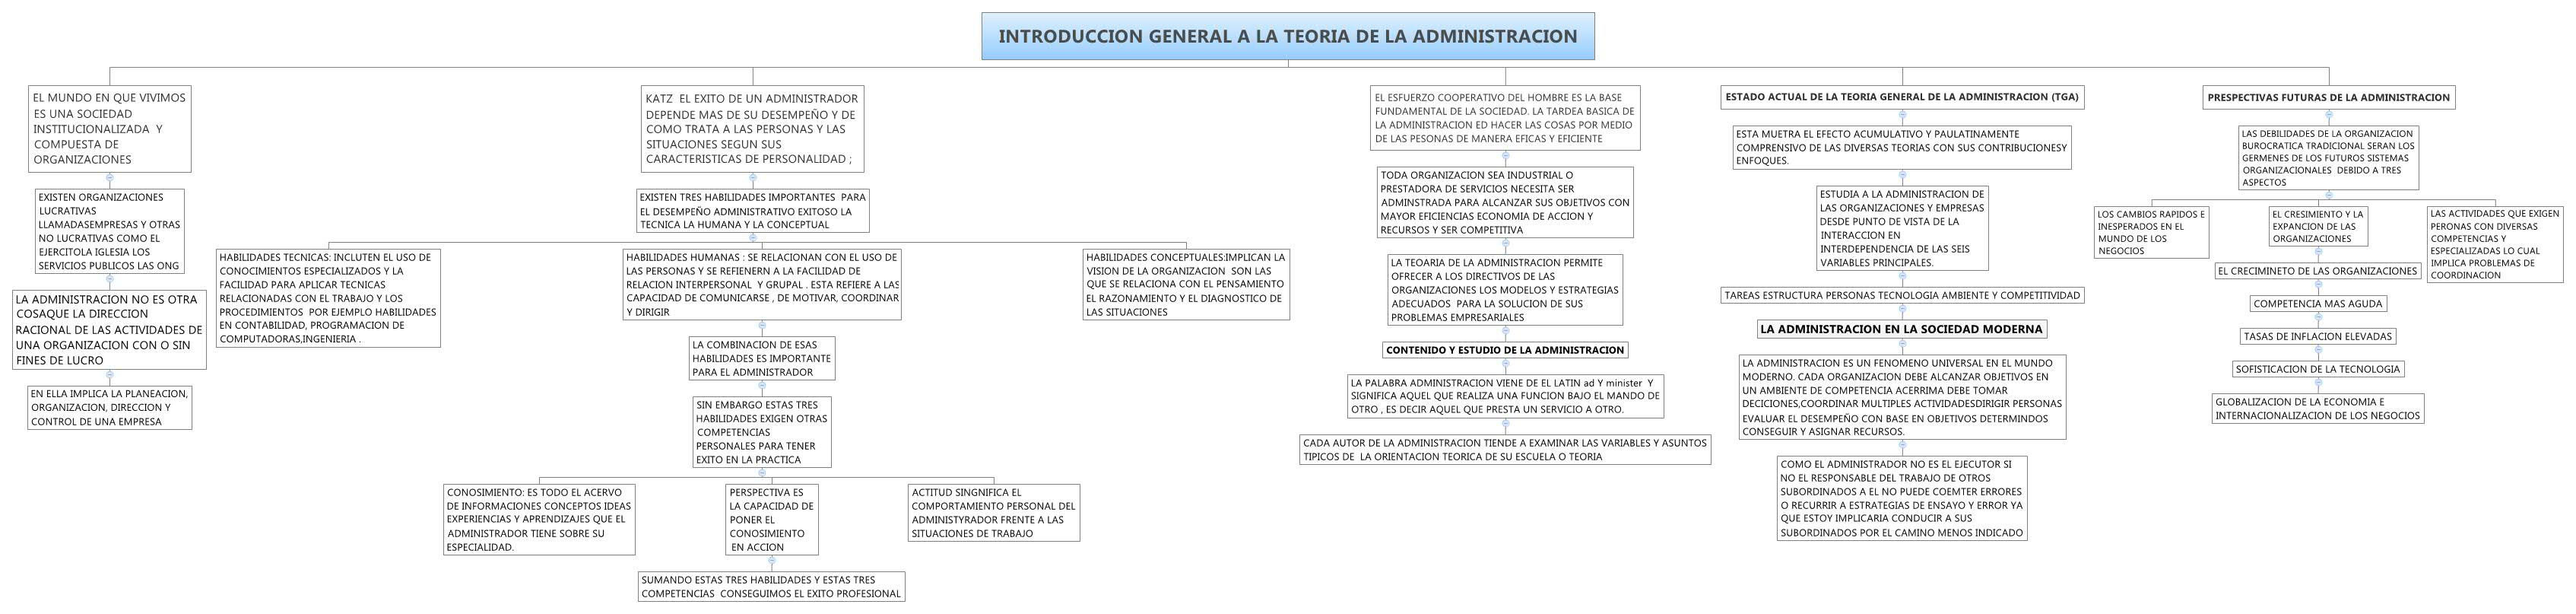 INTRODUCCION GENERAL A LA TEORIA DE LA ADMINISTRACION